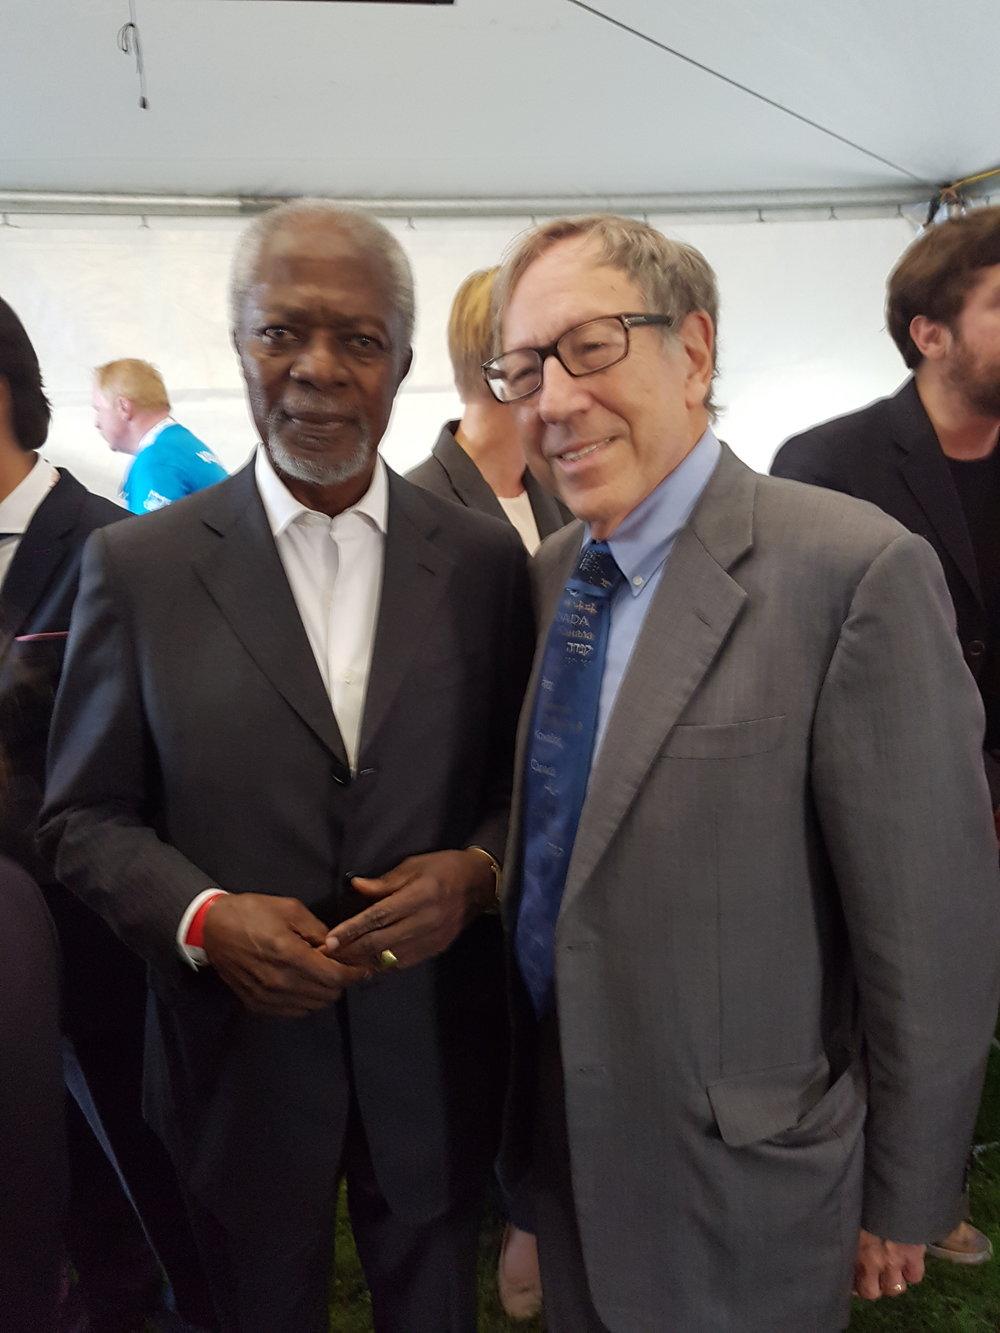 Kofi Annan, Nobel Laureate & UN Sec-Gen